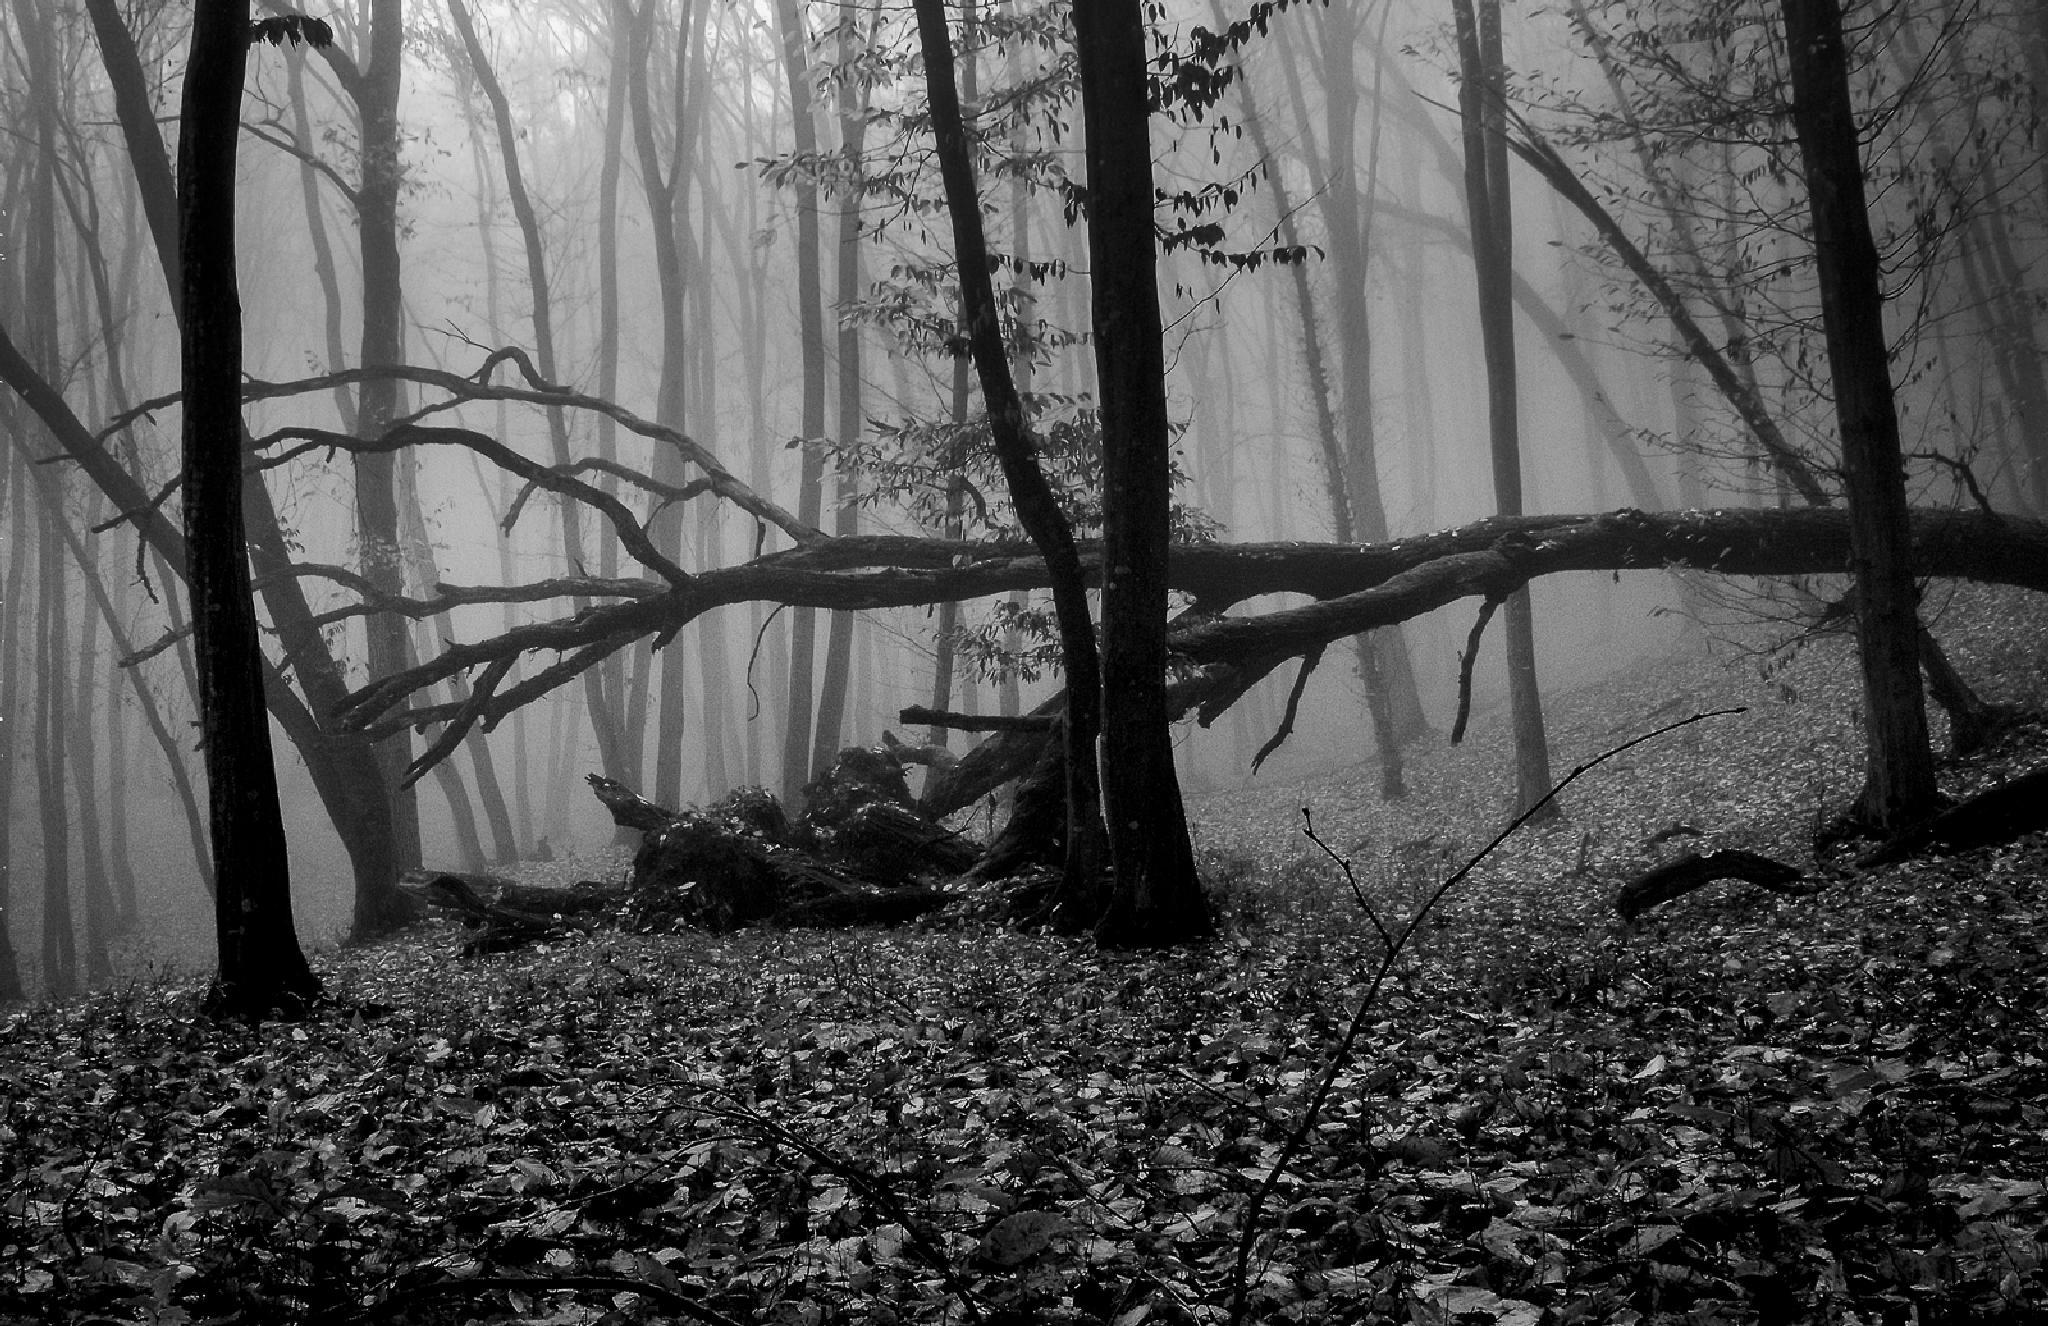 November forest by Attila Farkas